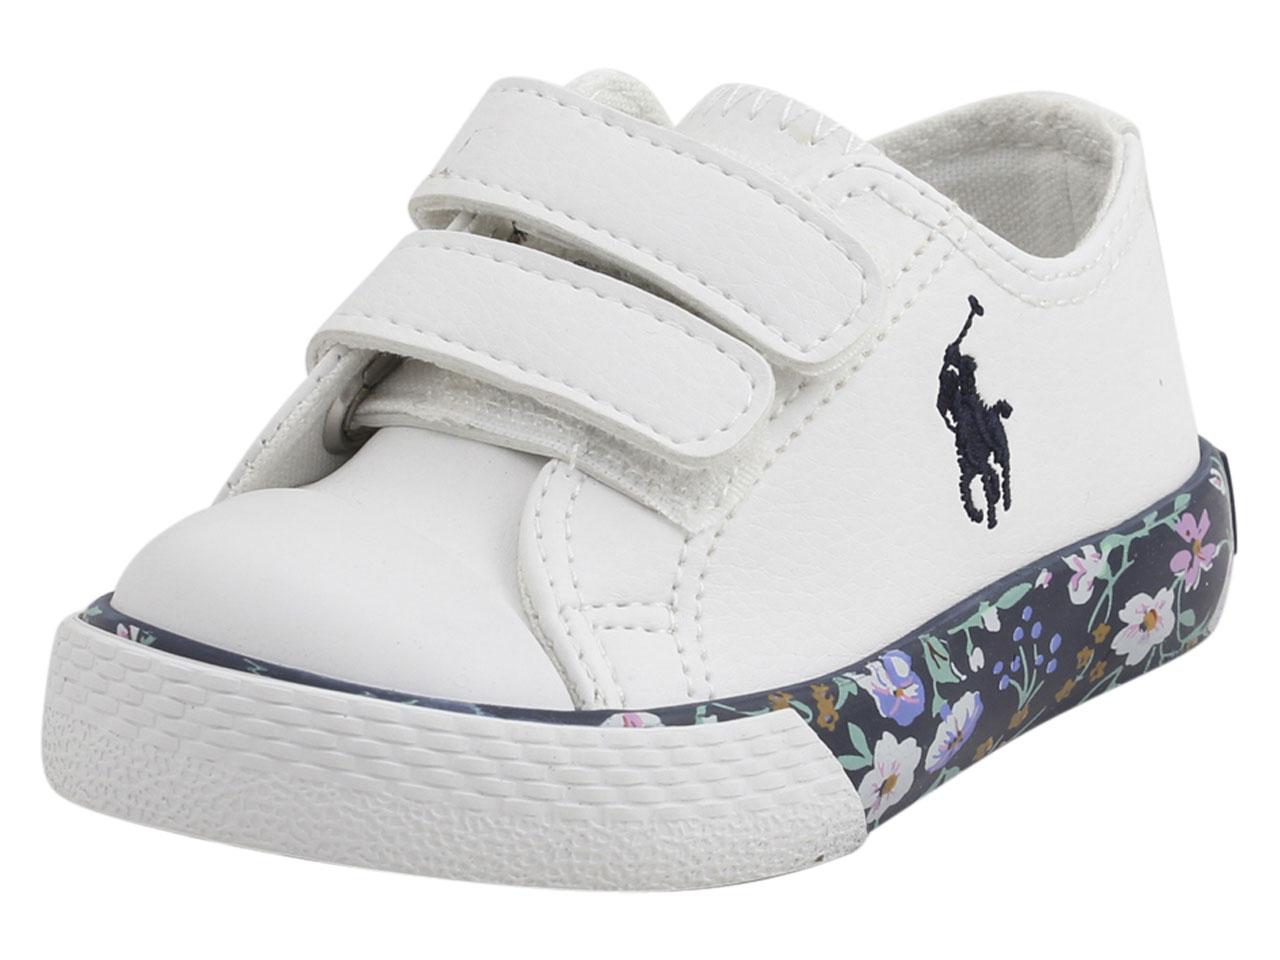 4fffafaa471 Polo Ralph Lauren Toddler Girl s Slone-EZ White Floral Sneakers ...